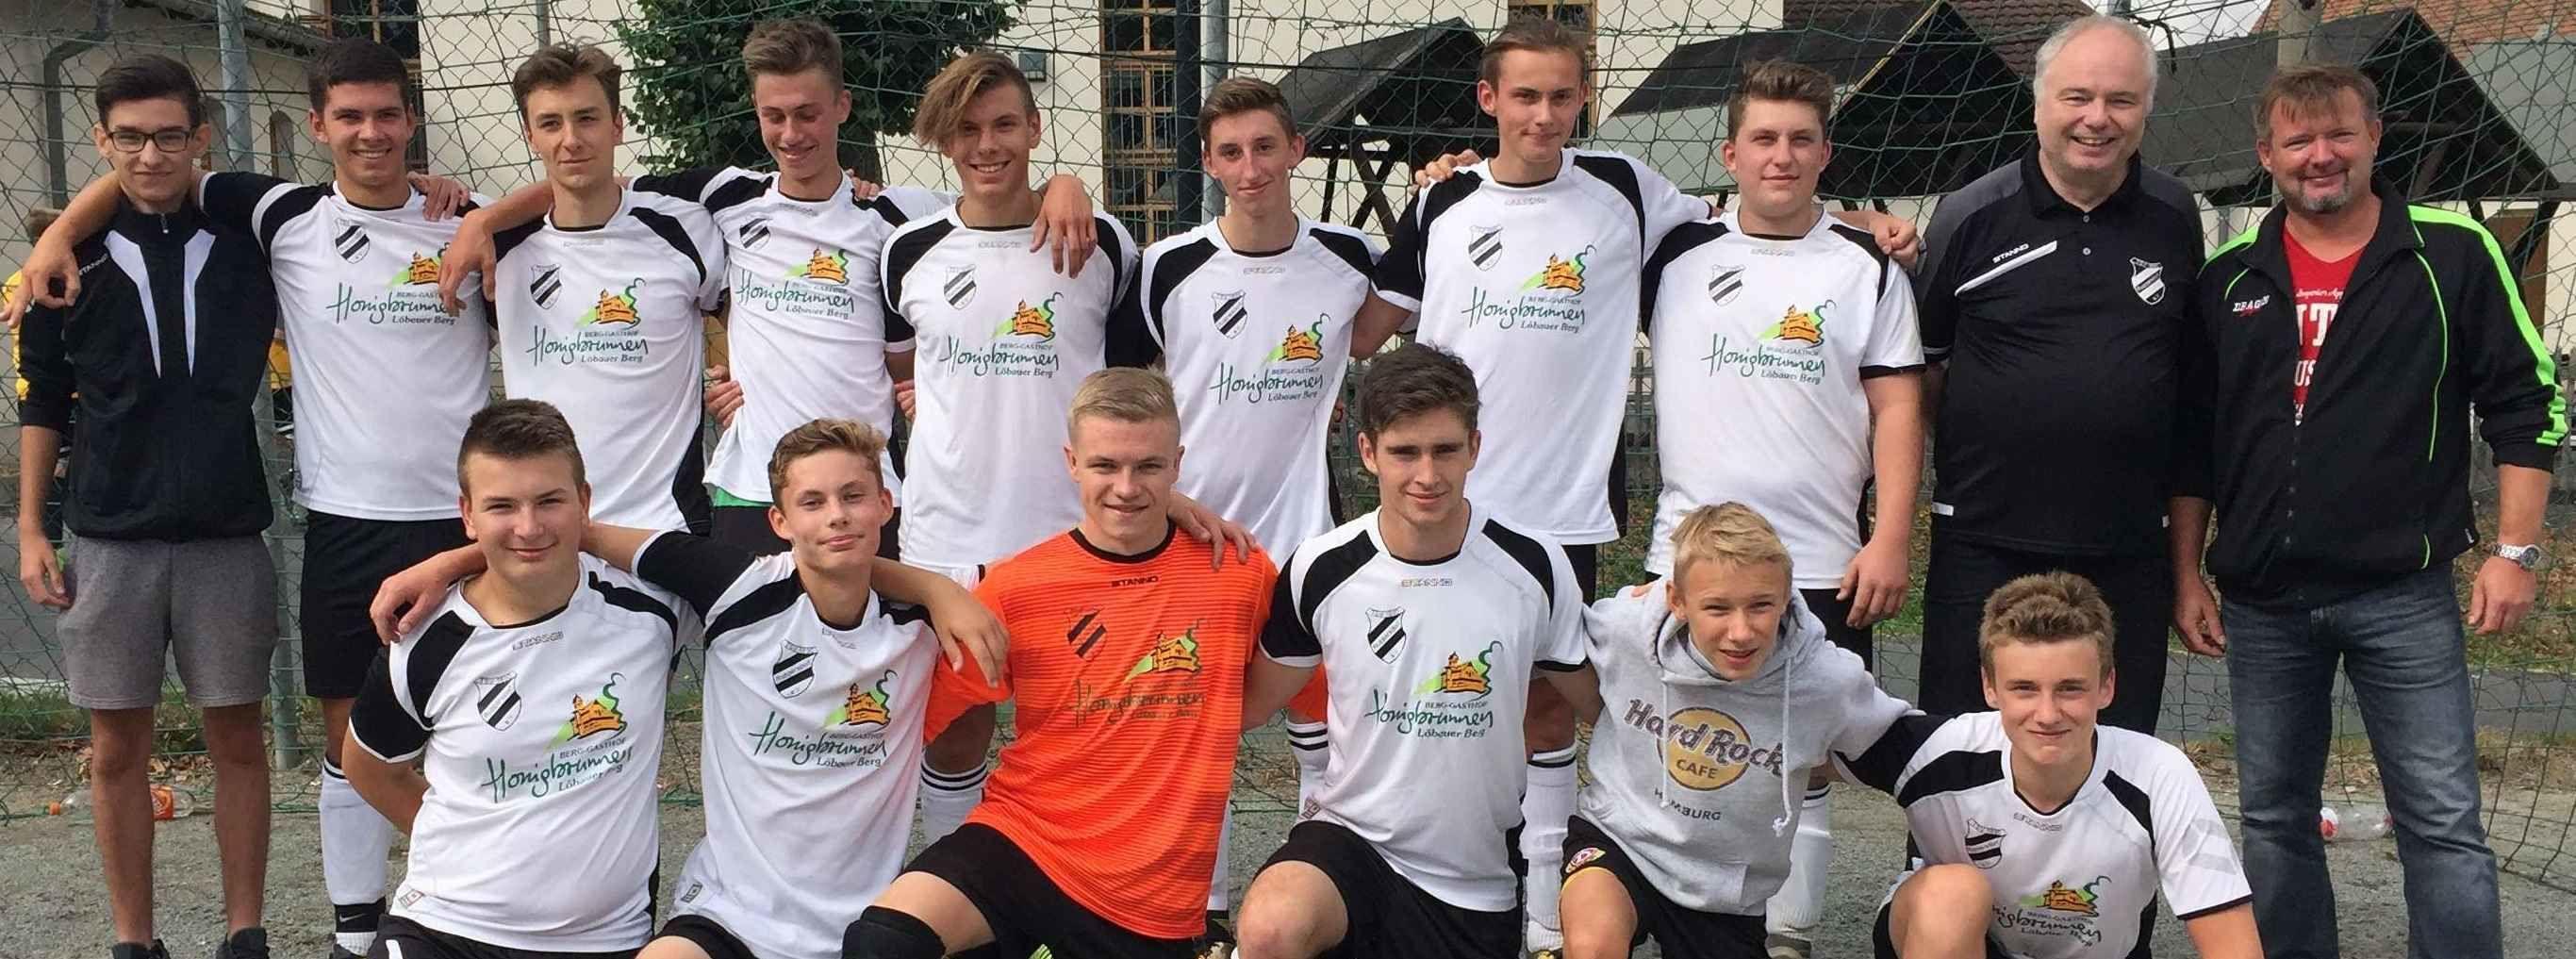 A-Junioren-SpG TSV 1890 Ruppersdorf/SG Leutersdorf/SG Blau-Weiß Obercunnersdorf, Spielzeit 2018/19